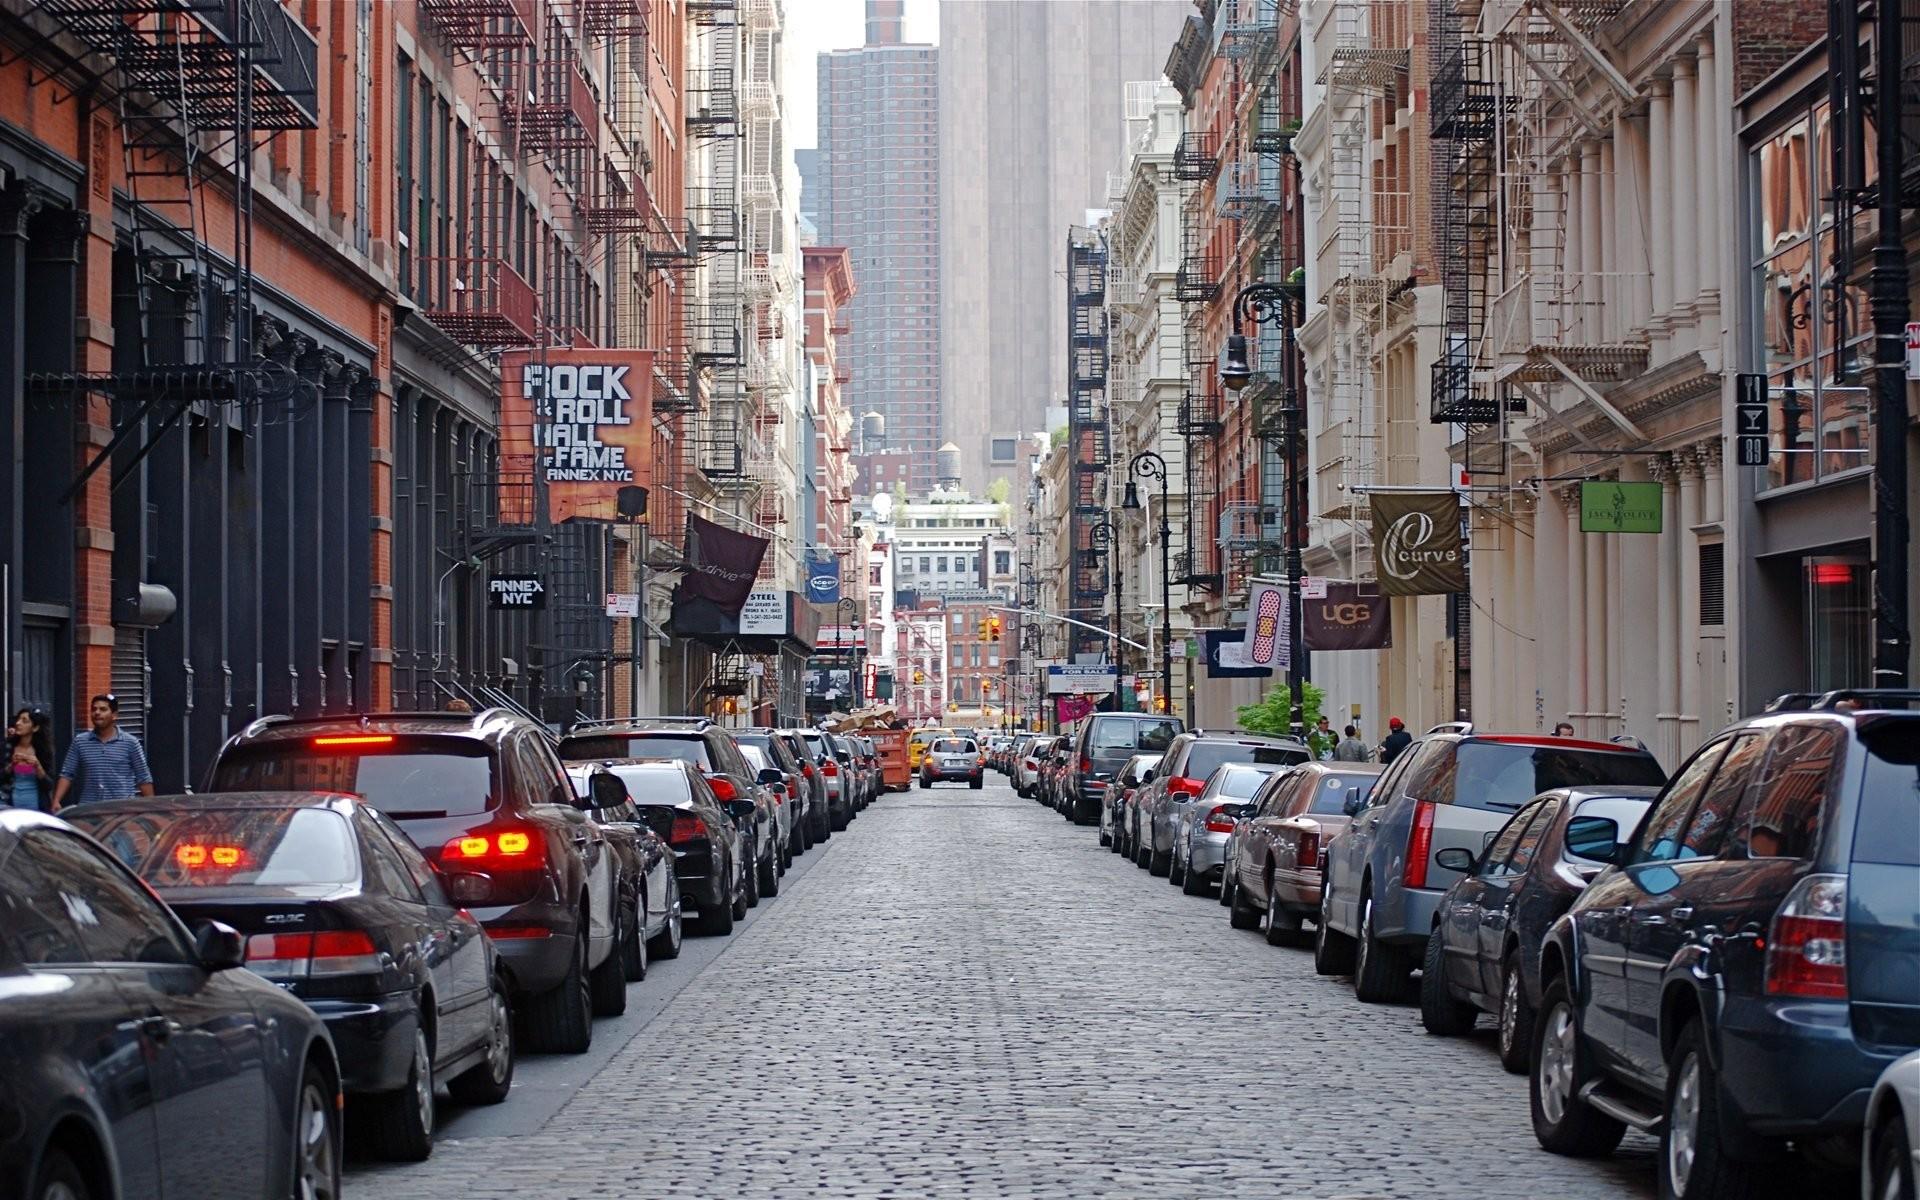 mercer street soho new york city street buildings machinery